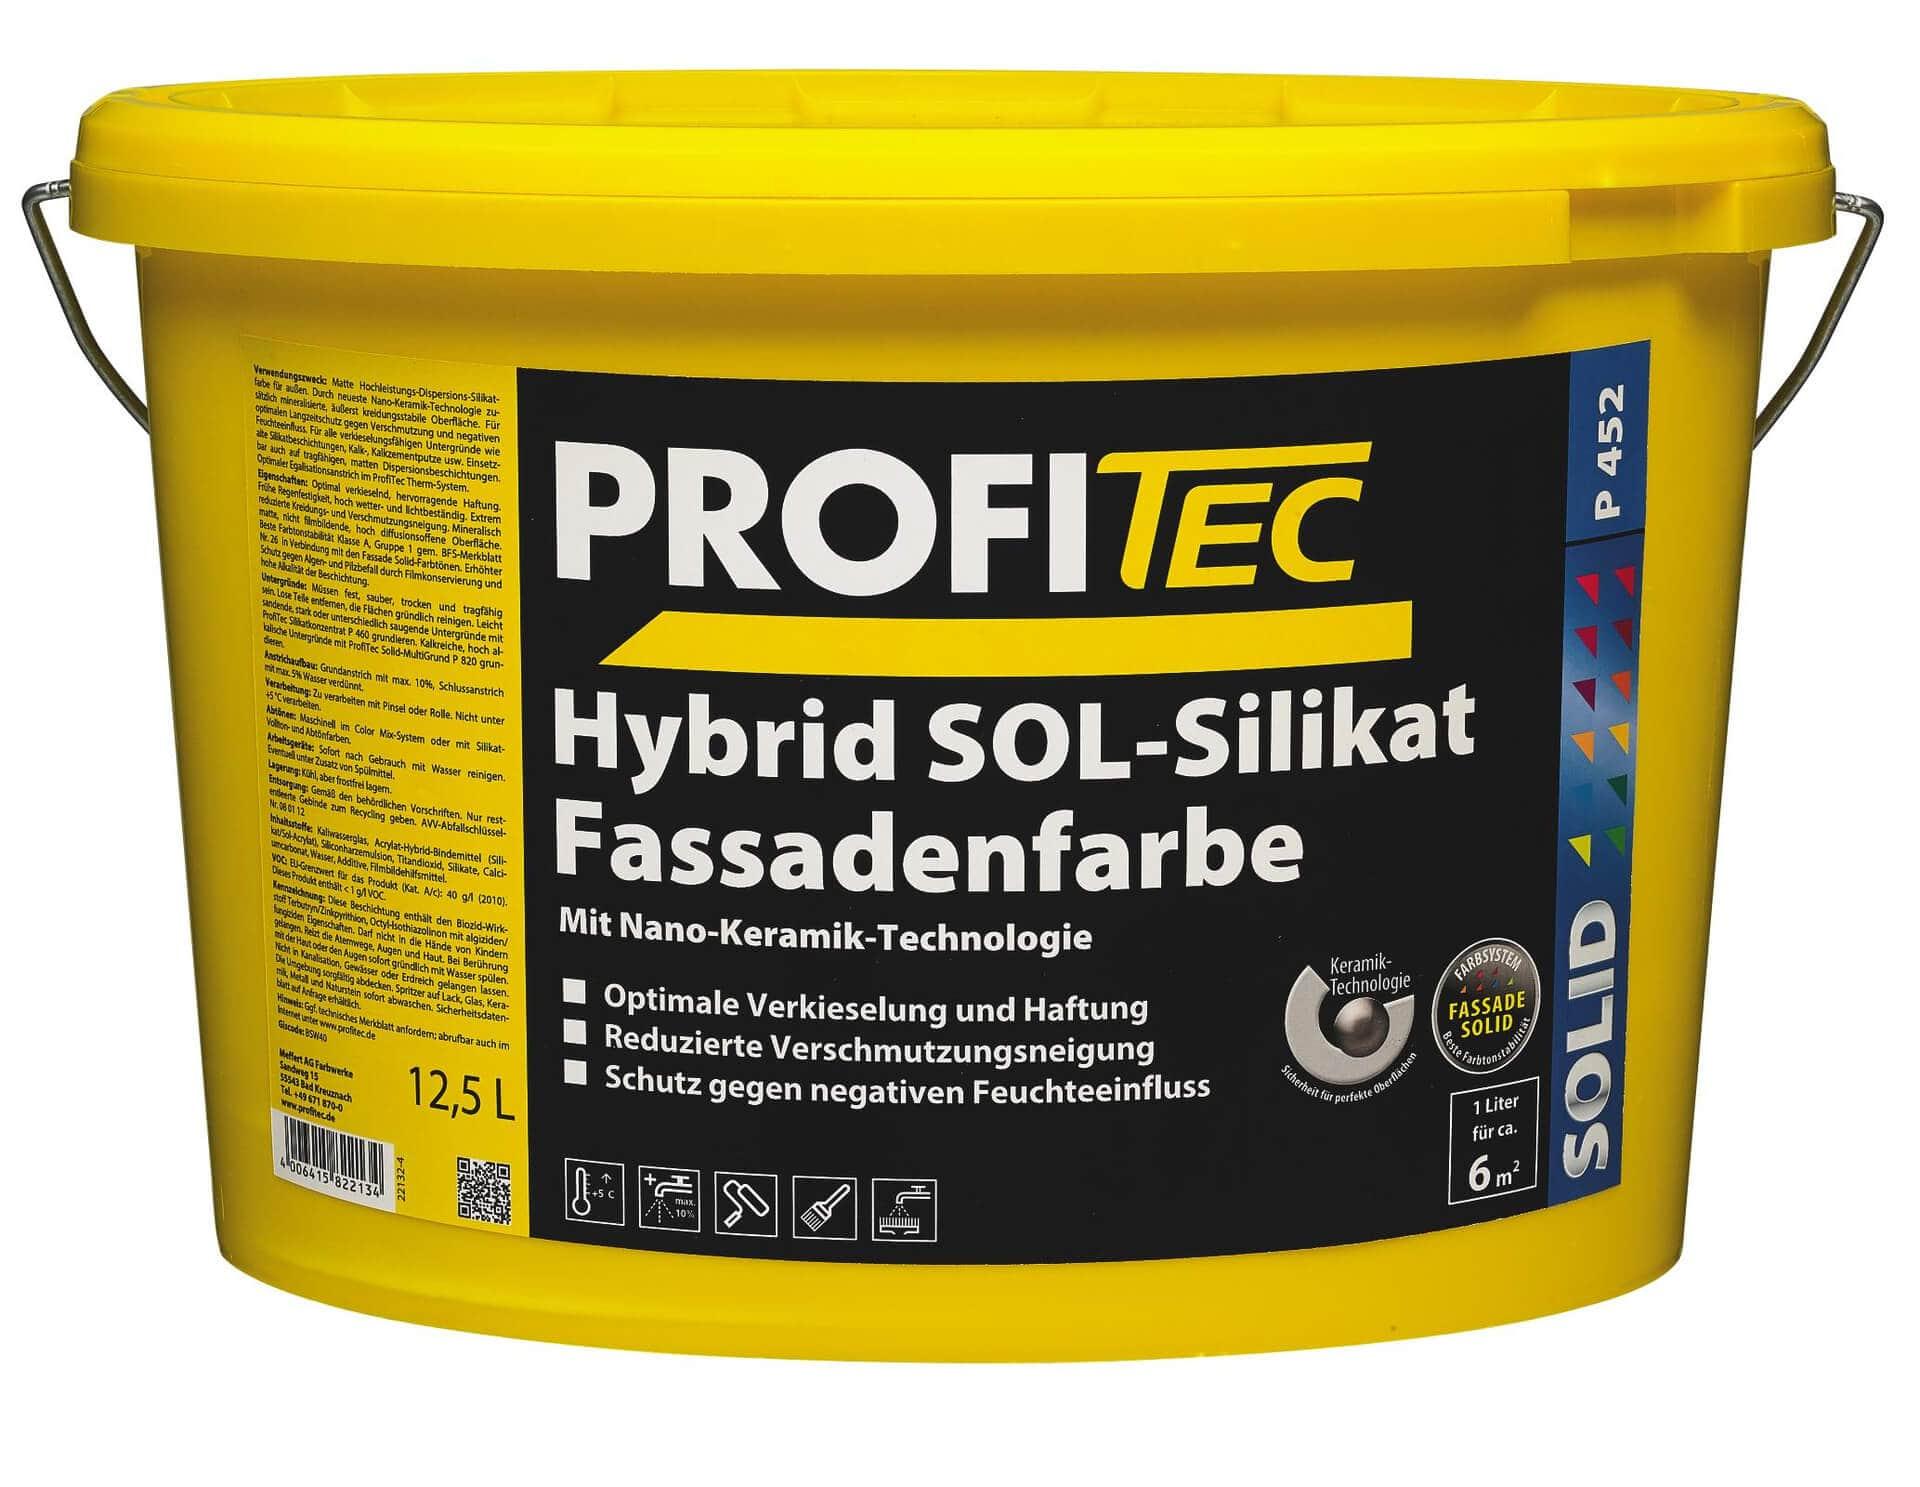 Hybrid SOL-Silikat Fassadenfarbe P 452